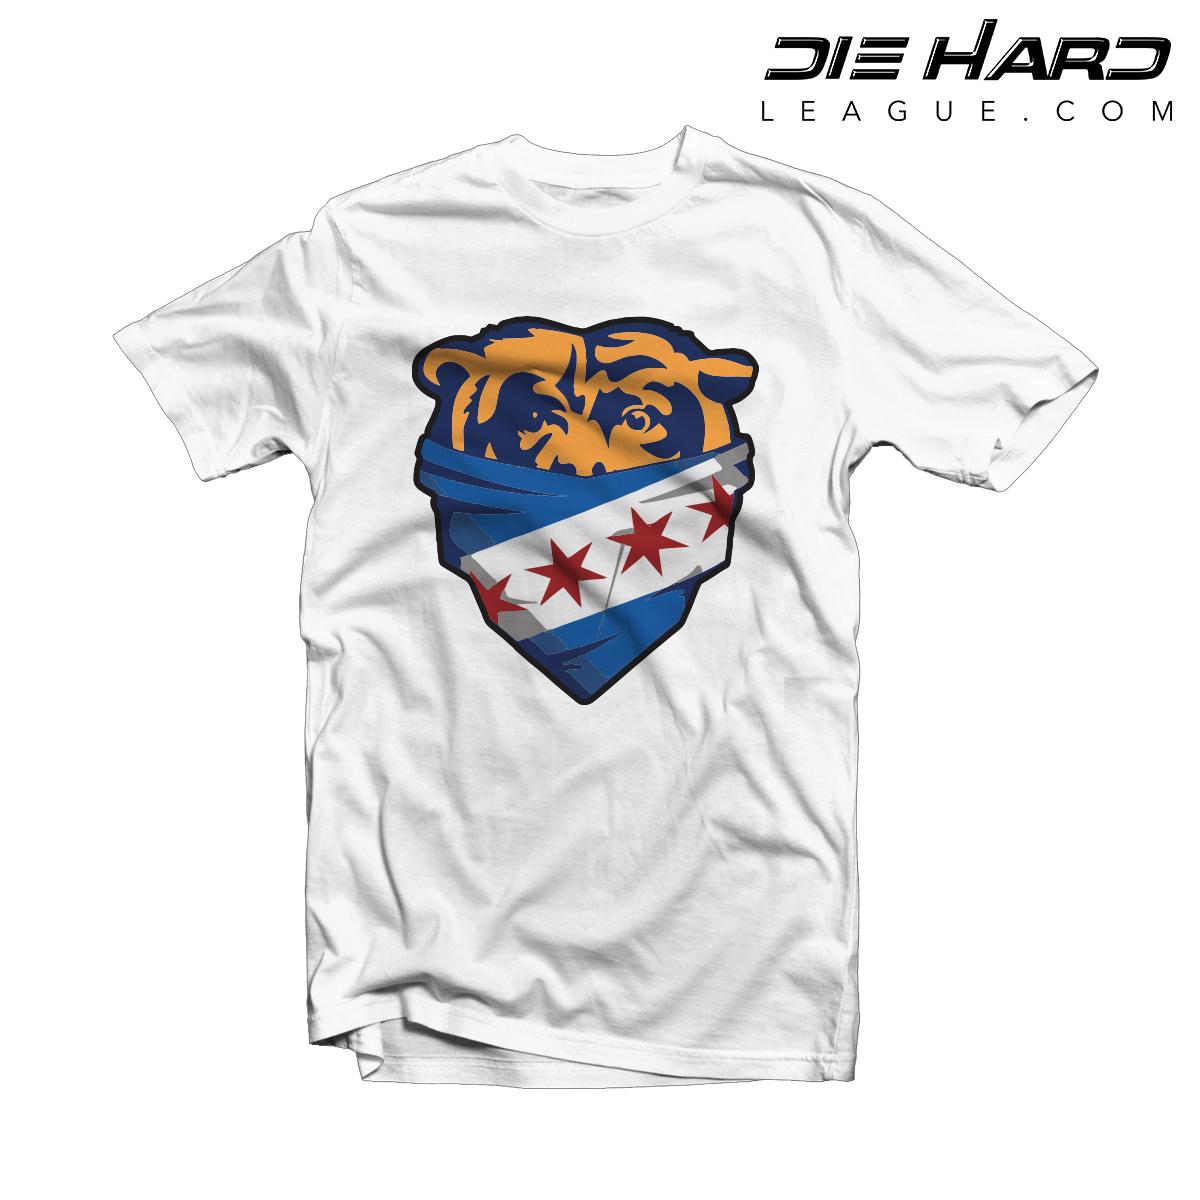 lowest price c83b3 81e39 Chicago Bears Shop - Chicago Bandanna White Tee